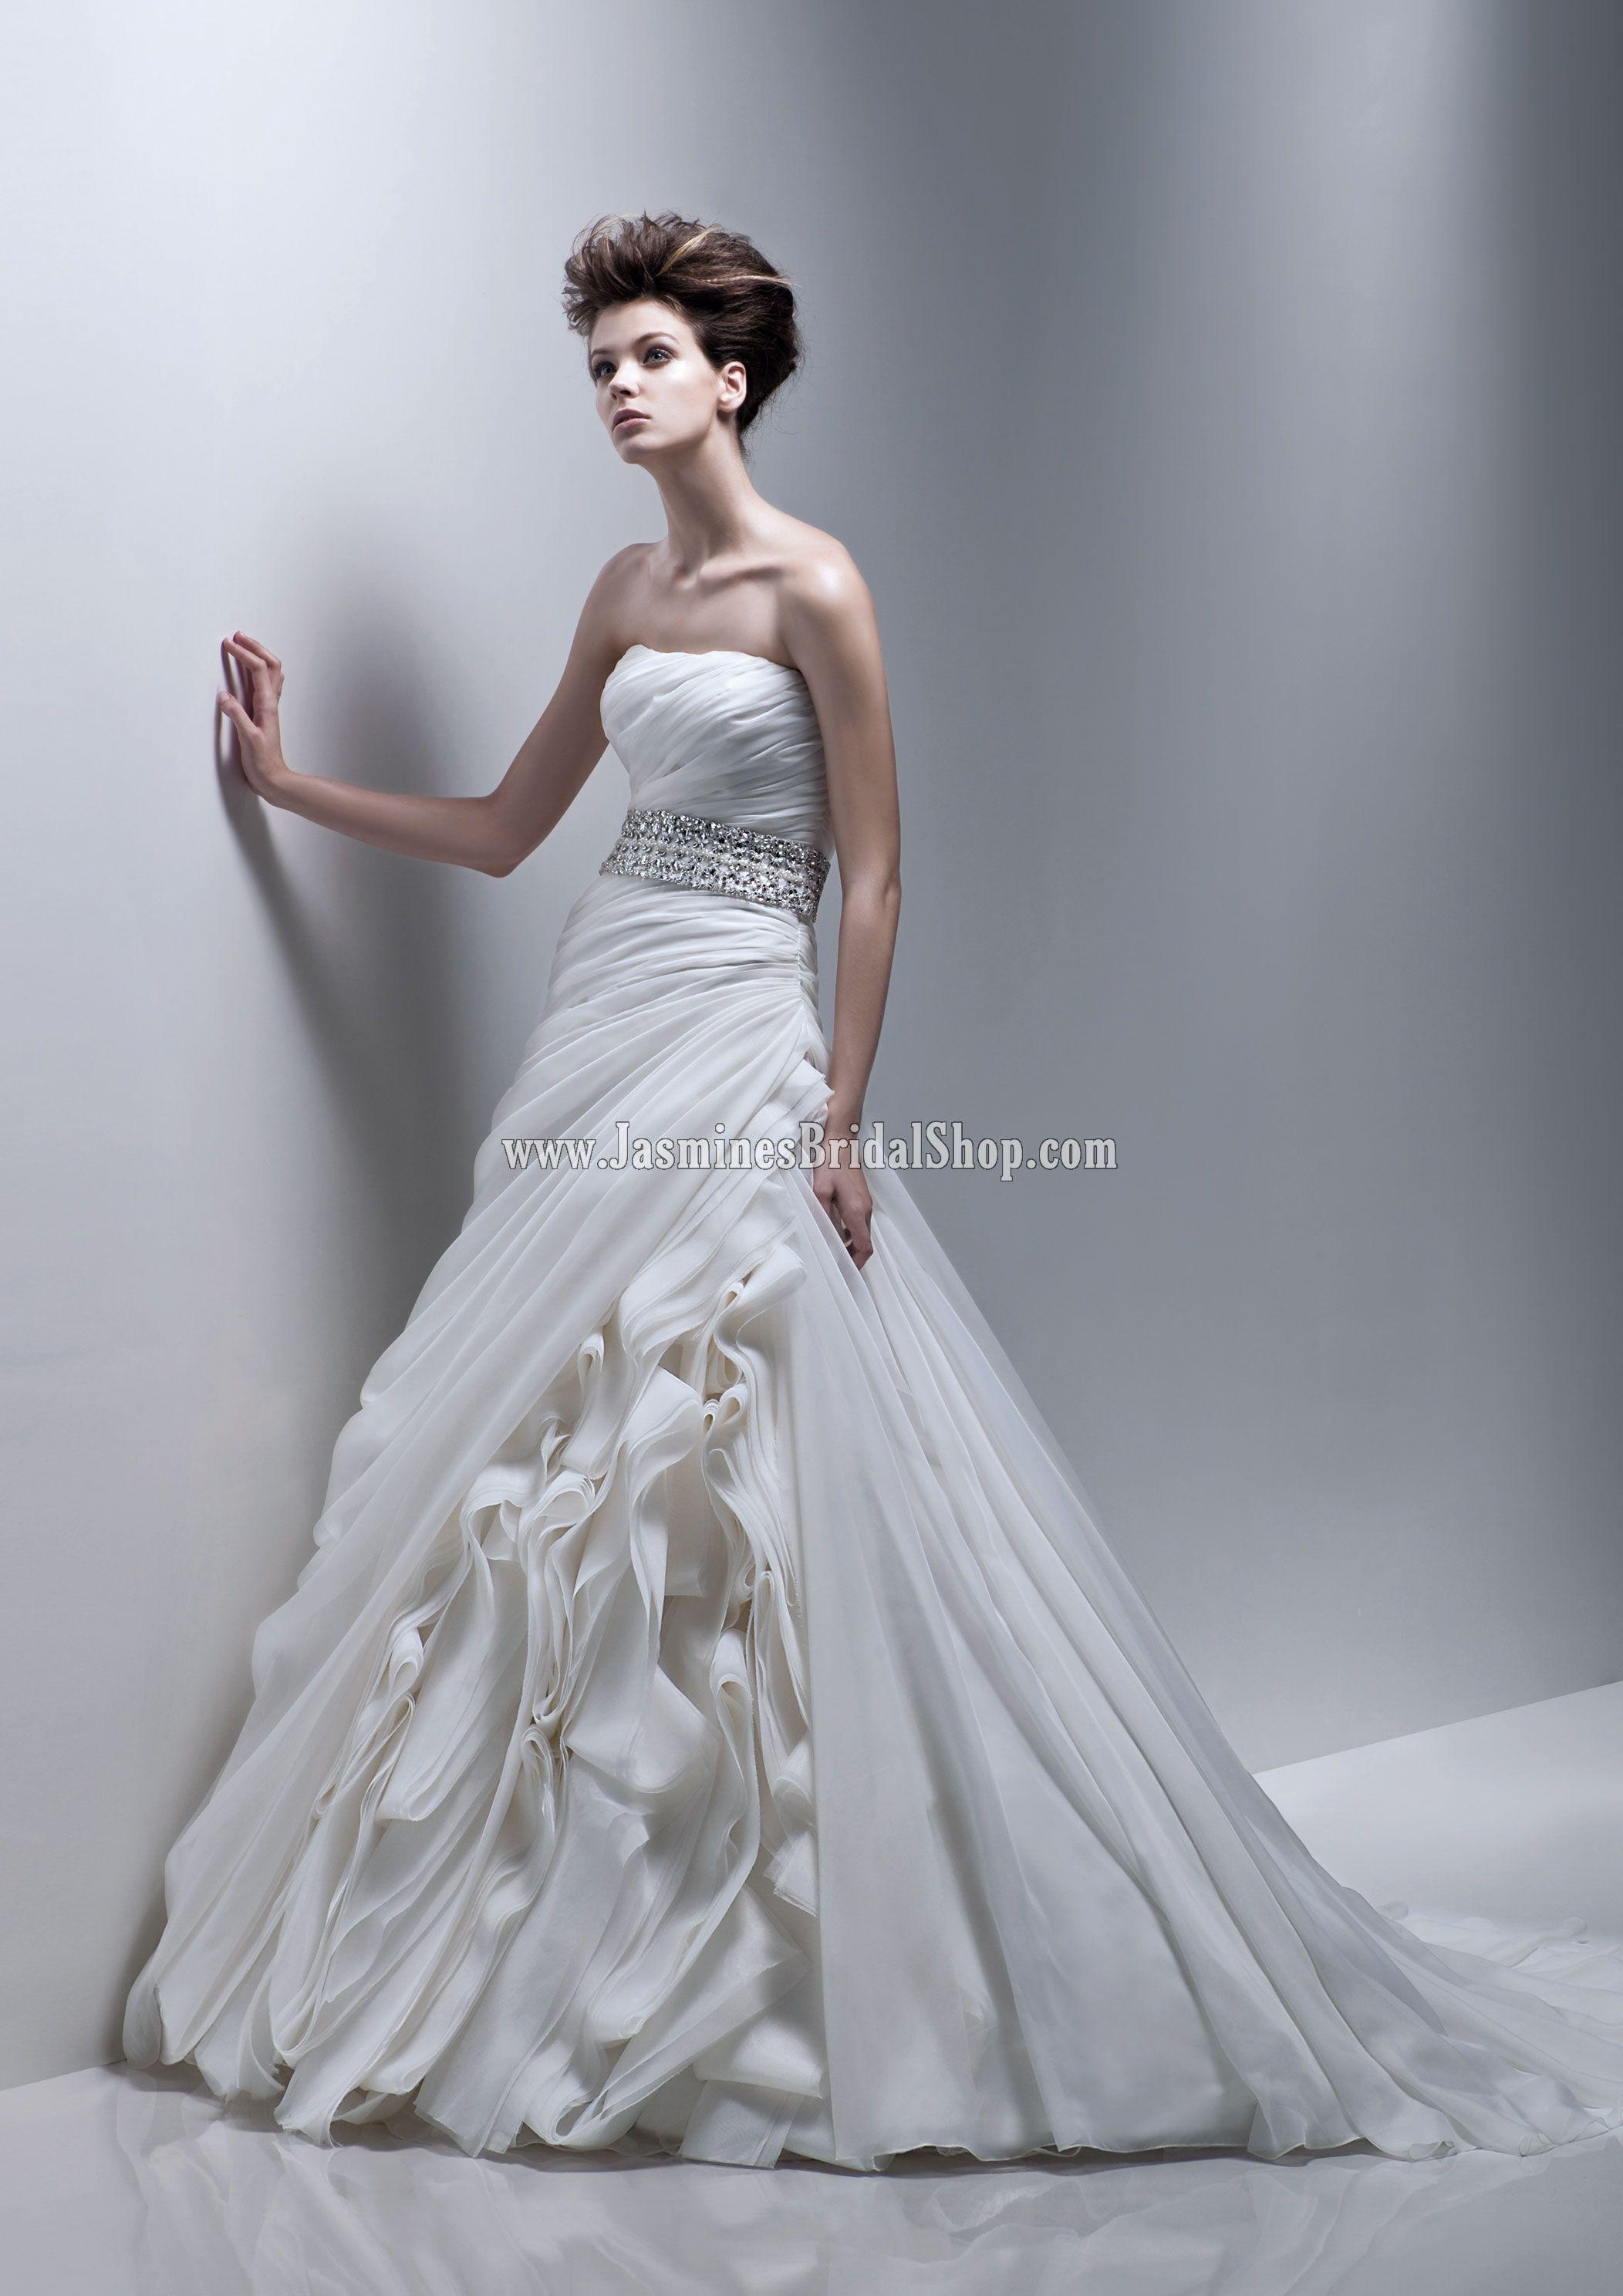 Fabi Bridal Gown (2011) Designer Bridal Inspirations Enzoani Jasmine's Bridal Shop - Wedding Dress, Cocktail Dress, Bridal Accessories